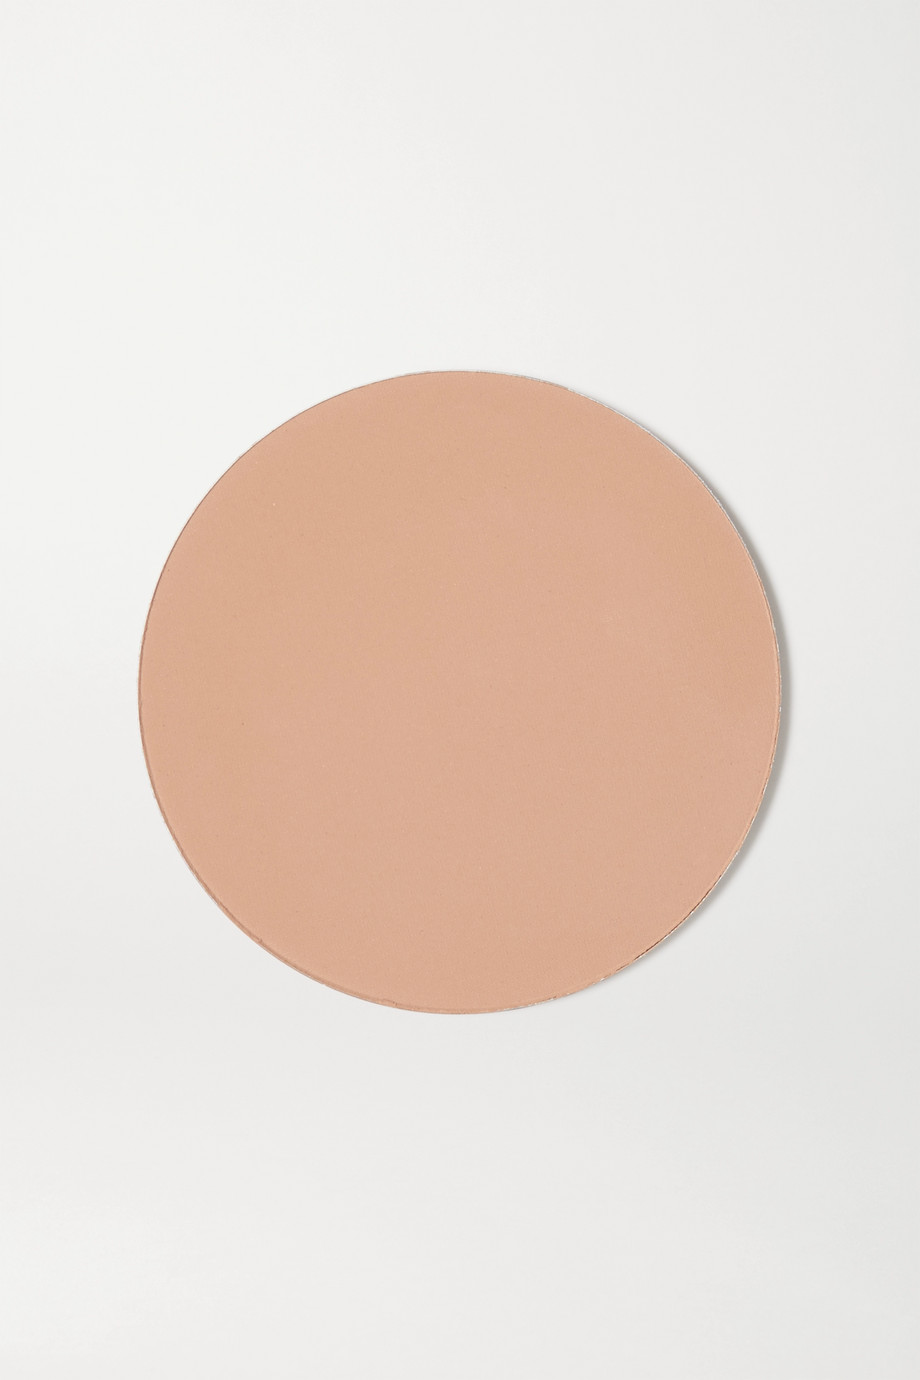 Charlotte Tilbury Airbrush Bronzer Refill - 1 Fair